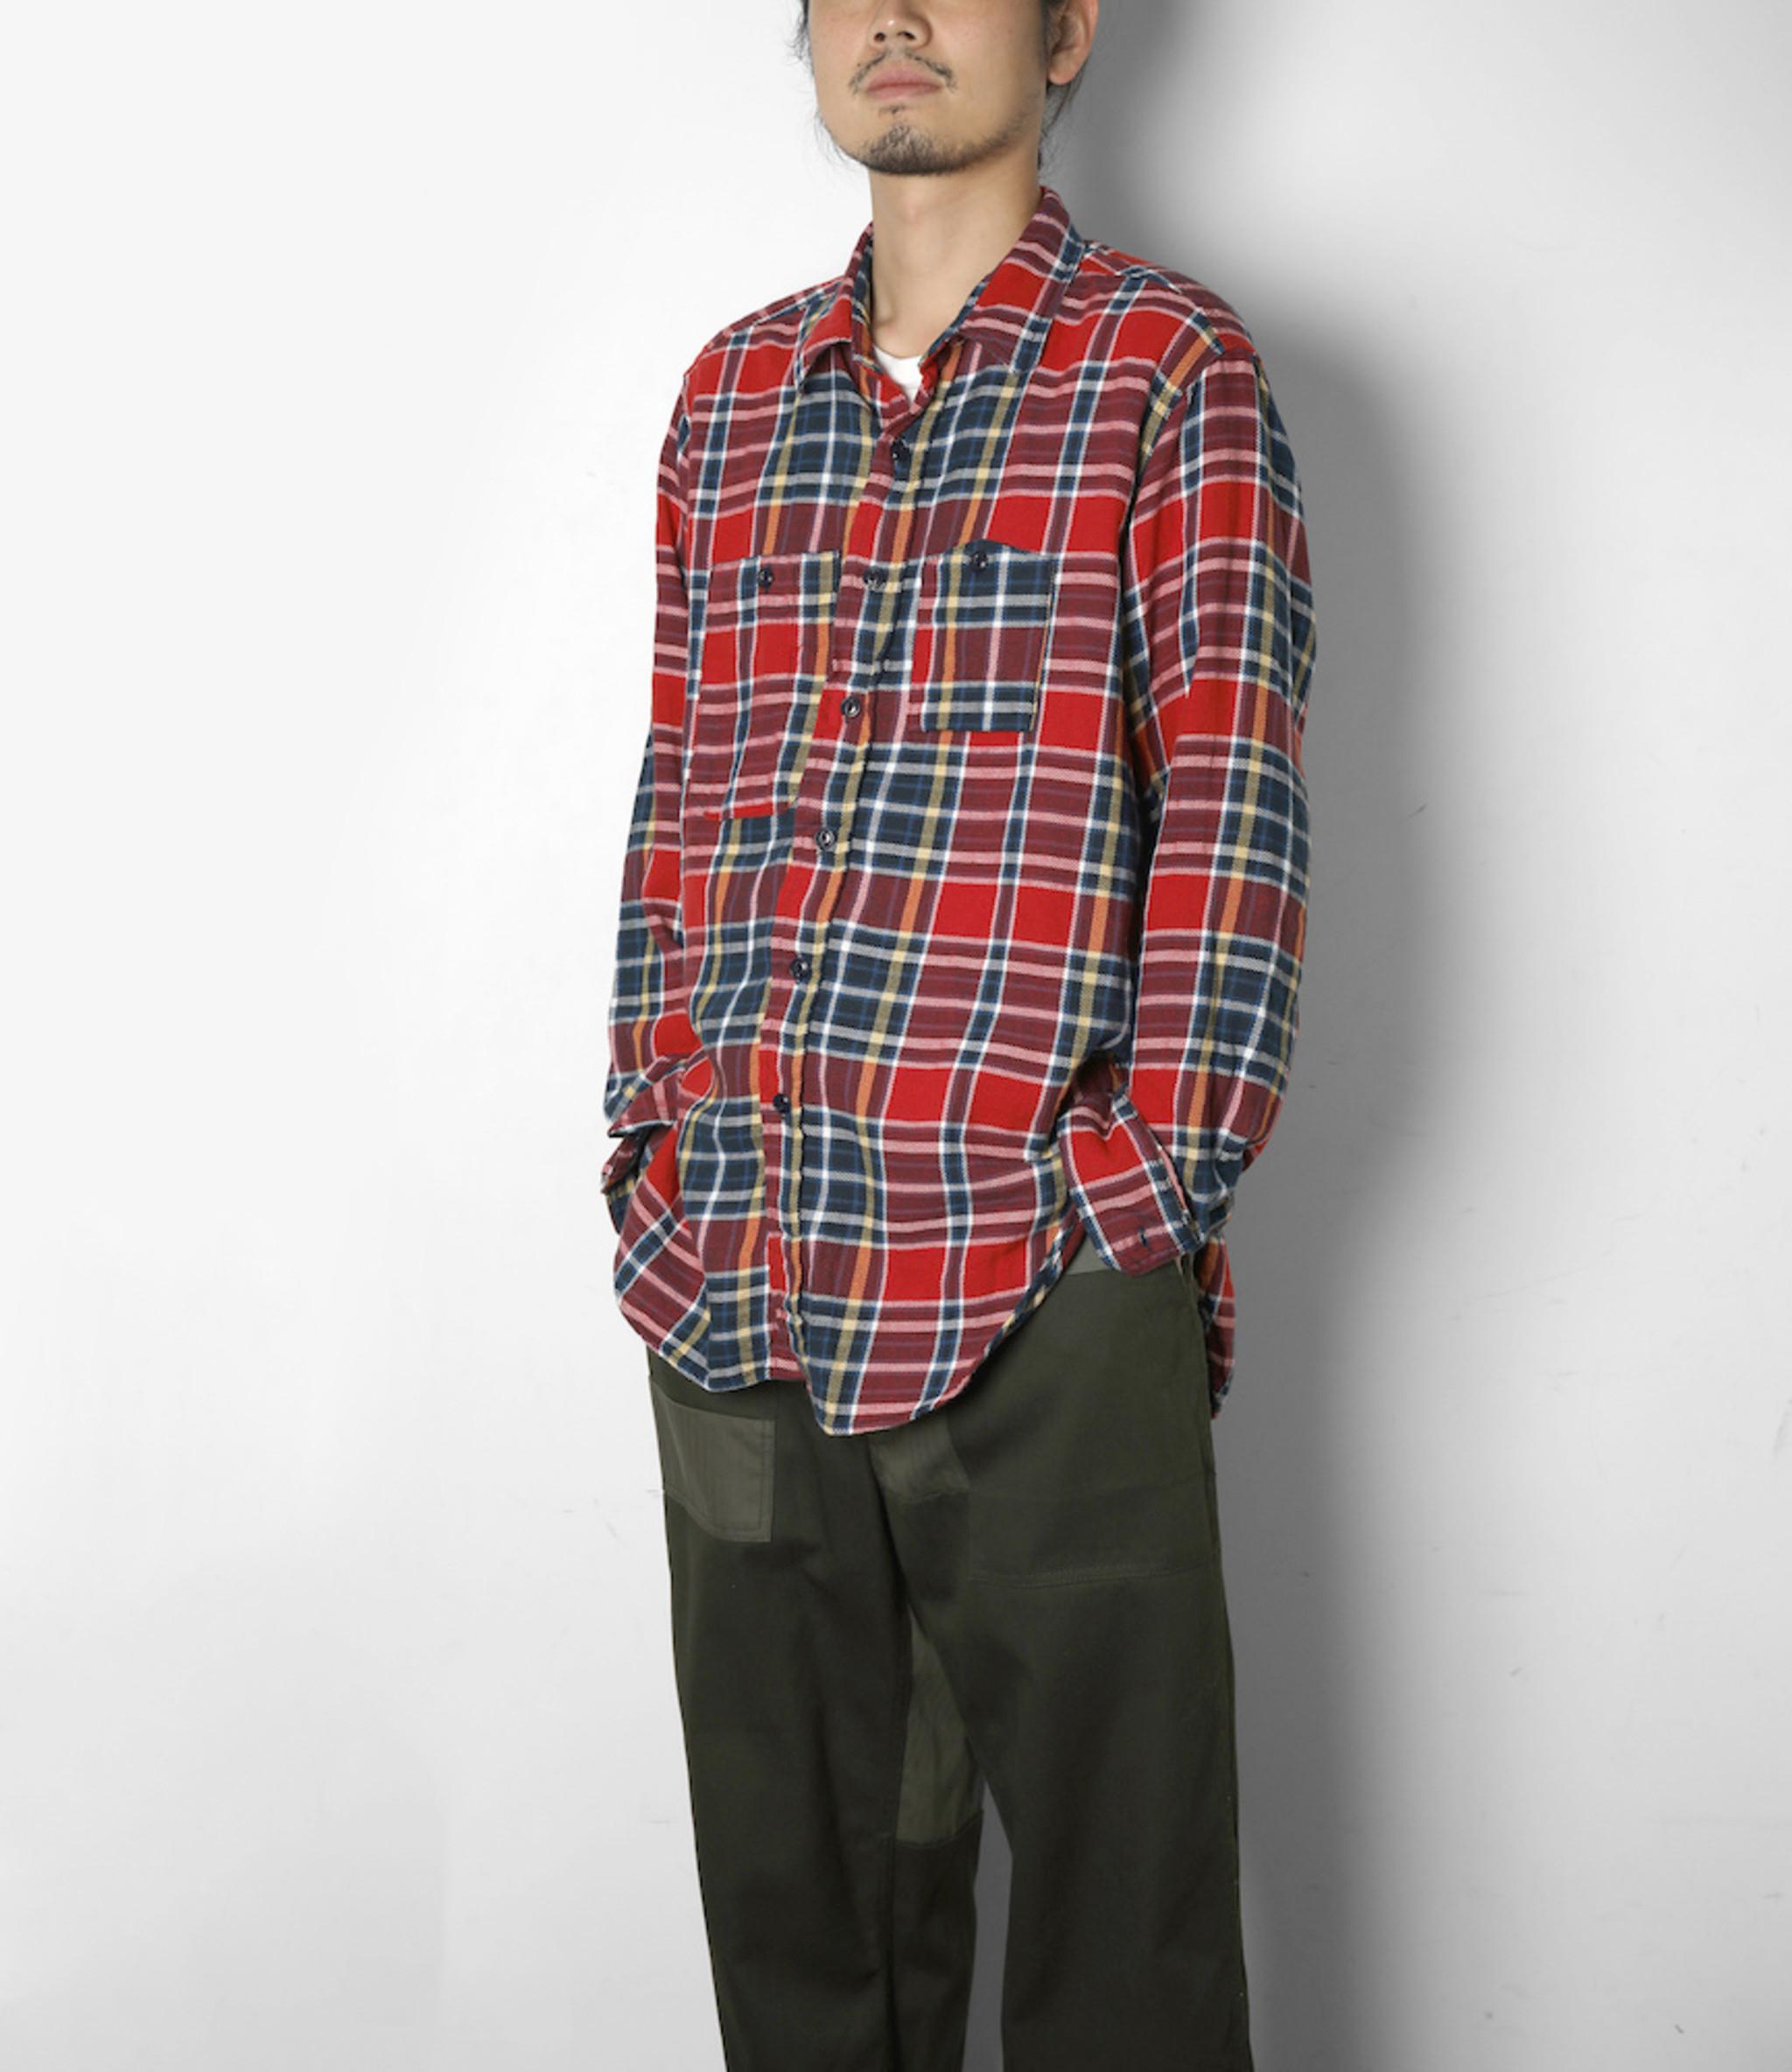 Engineered Garments Work Shirt - Red/Navy Cotton Twill Plaid